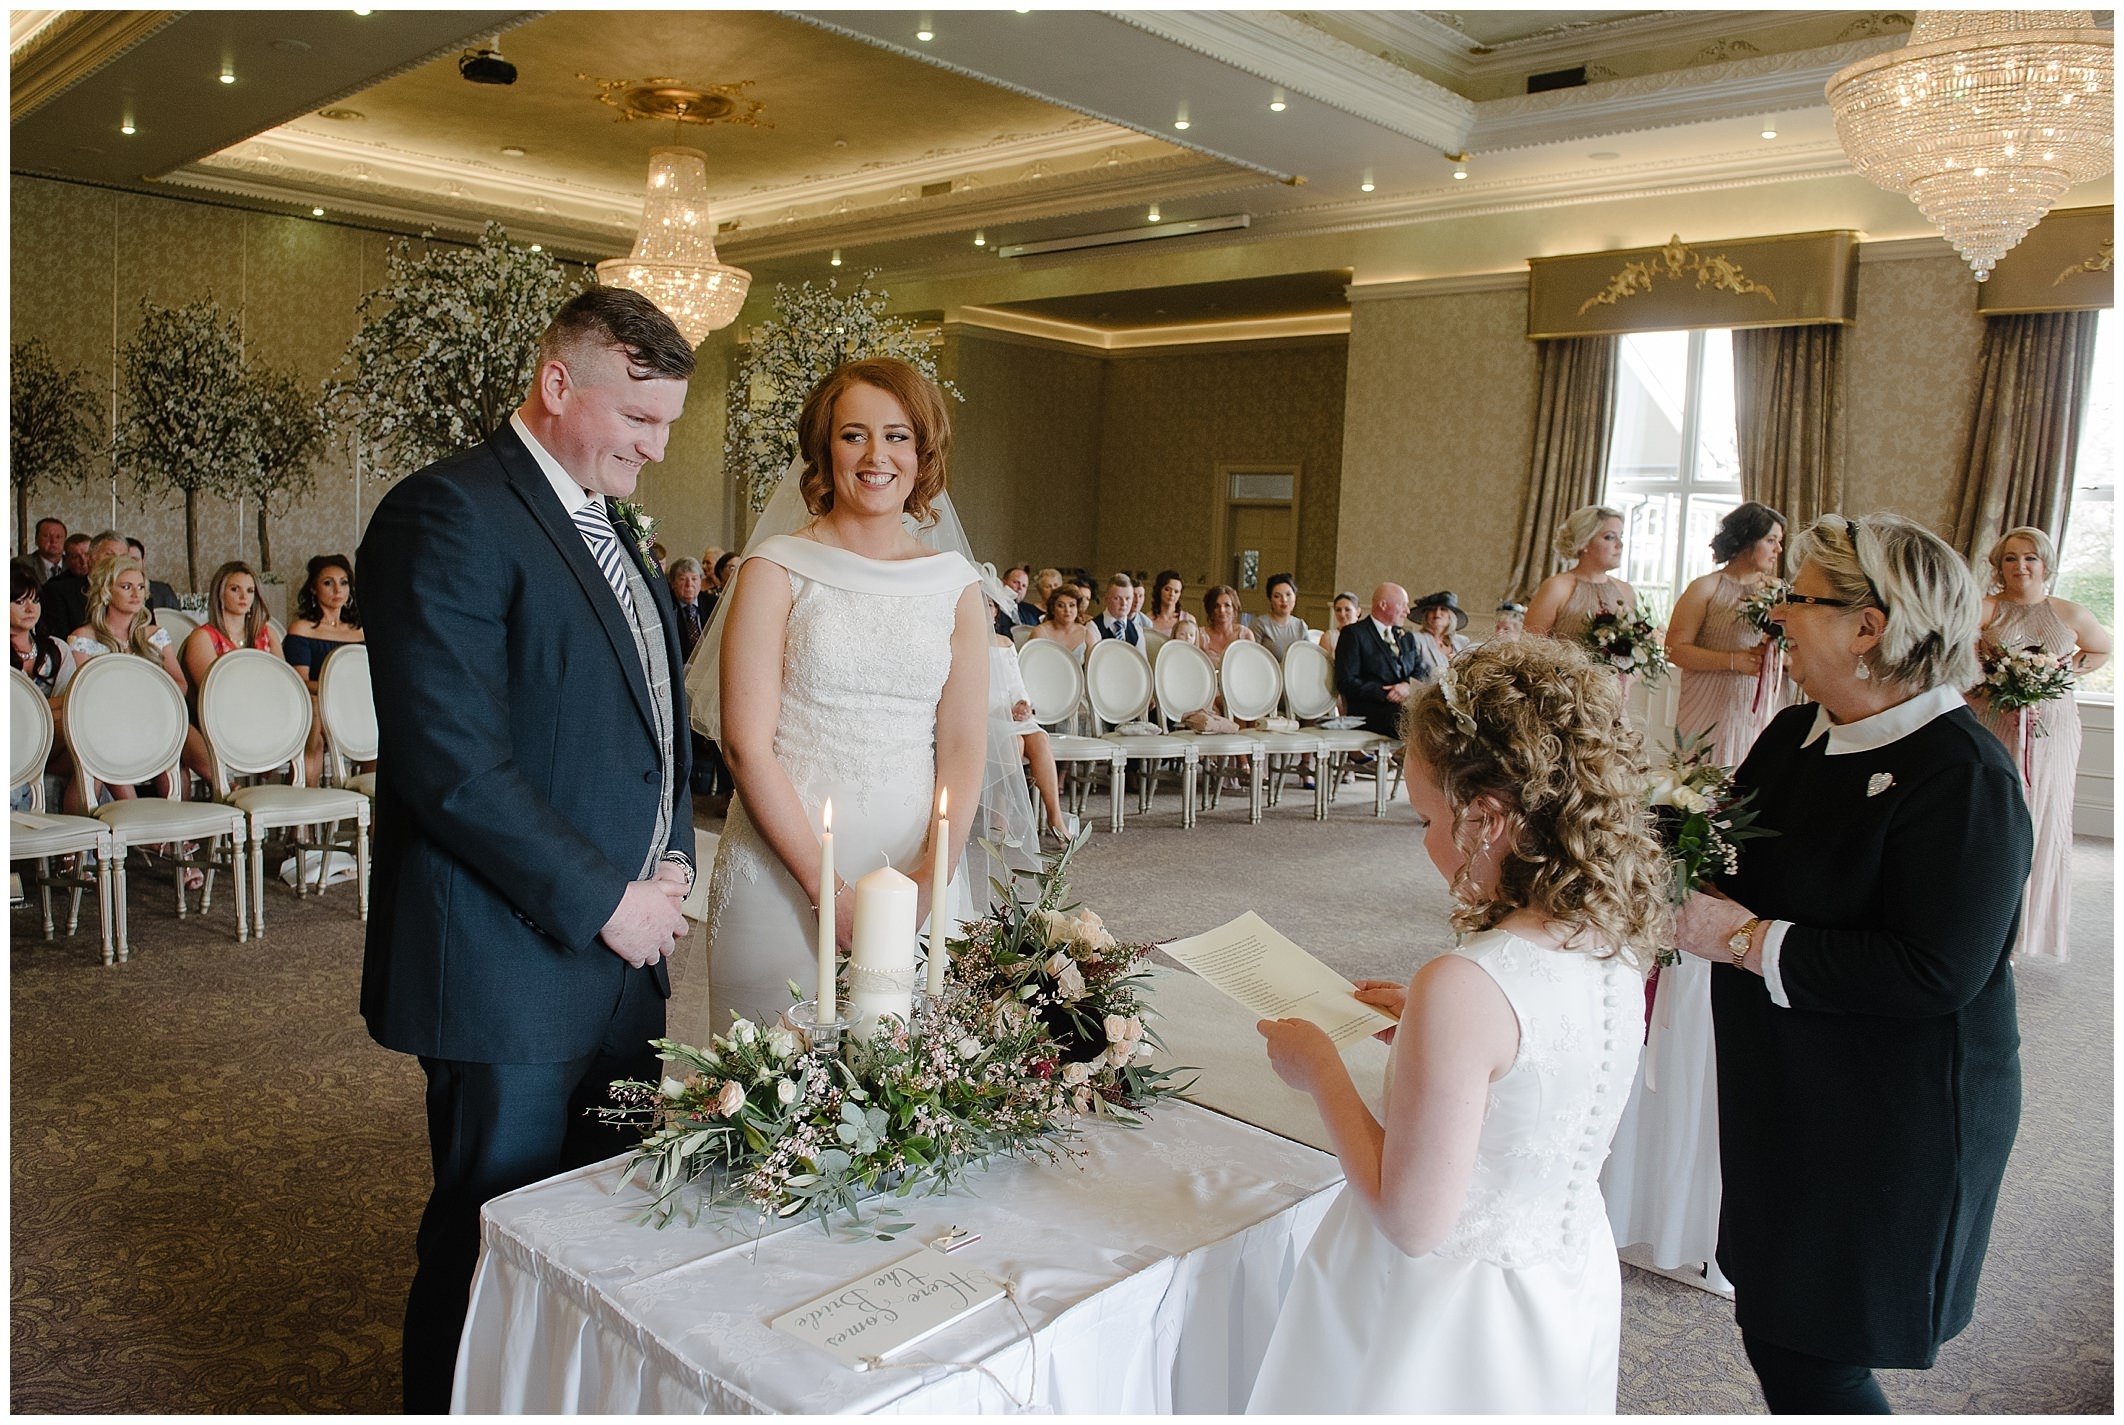 corick-house-wedding-hannah-gary-jude-browne-photography_0041.jpg